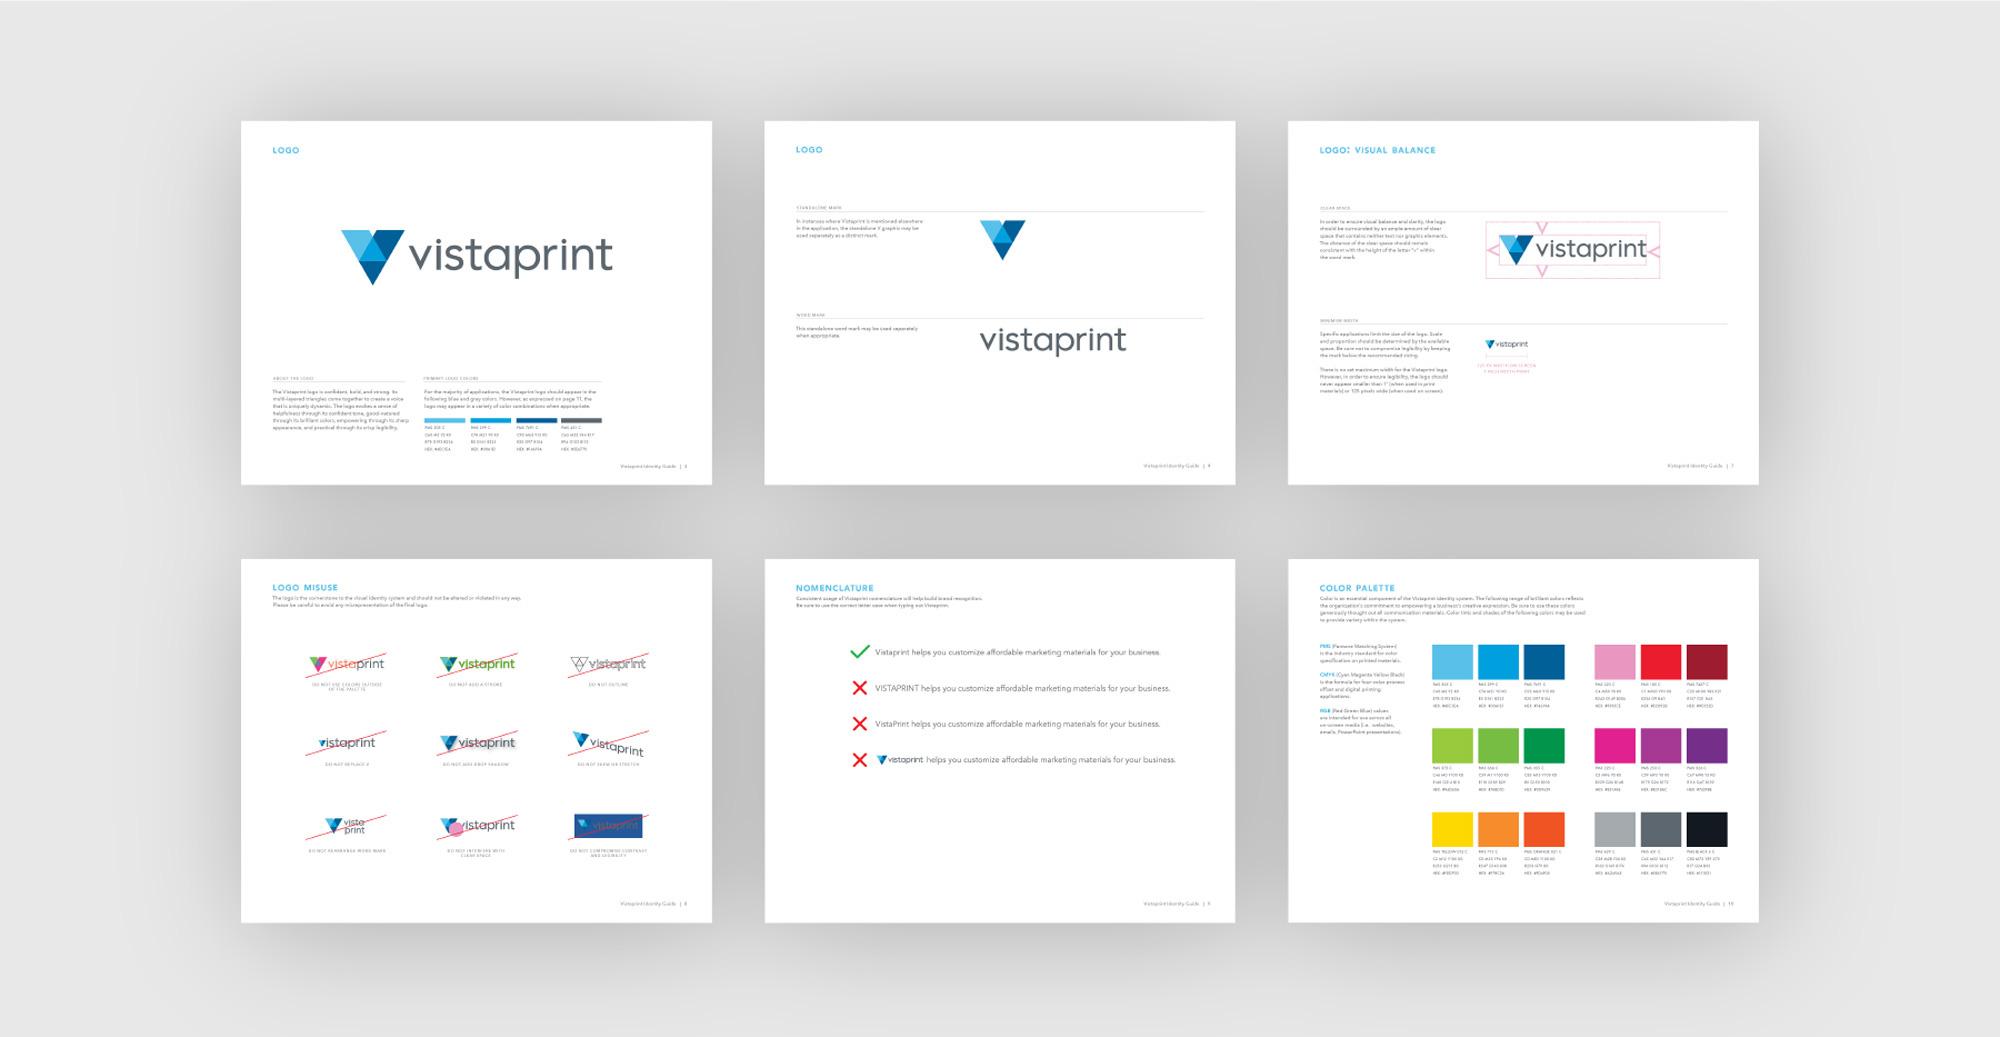 vistaprint-15